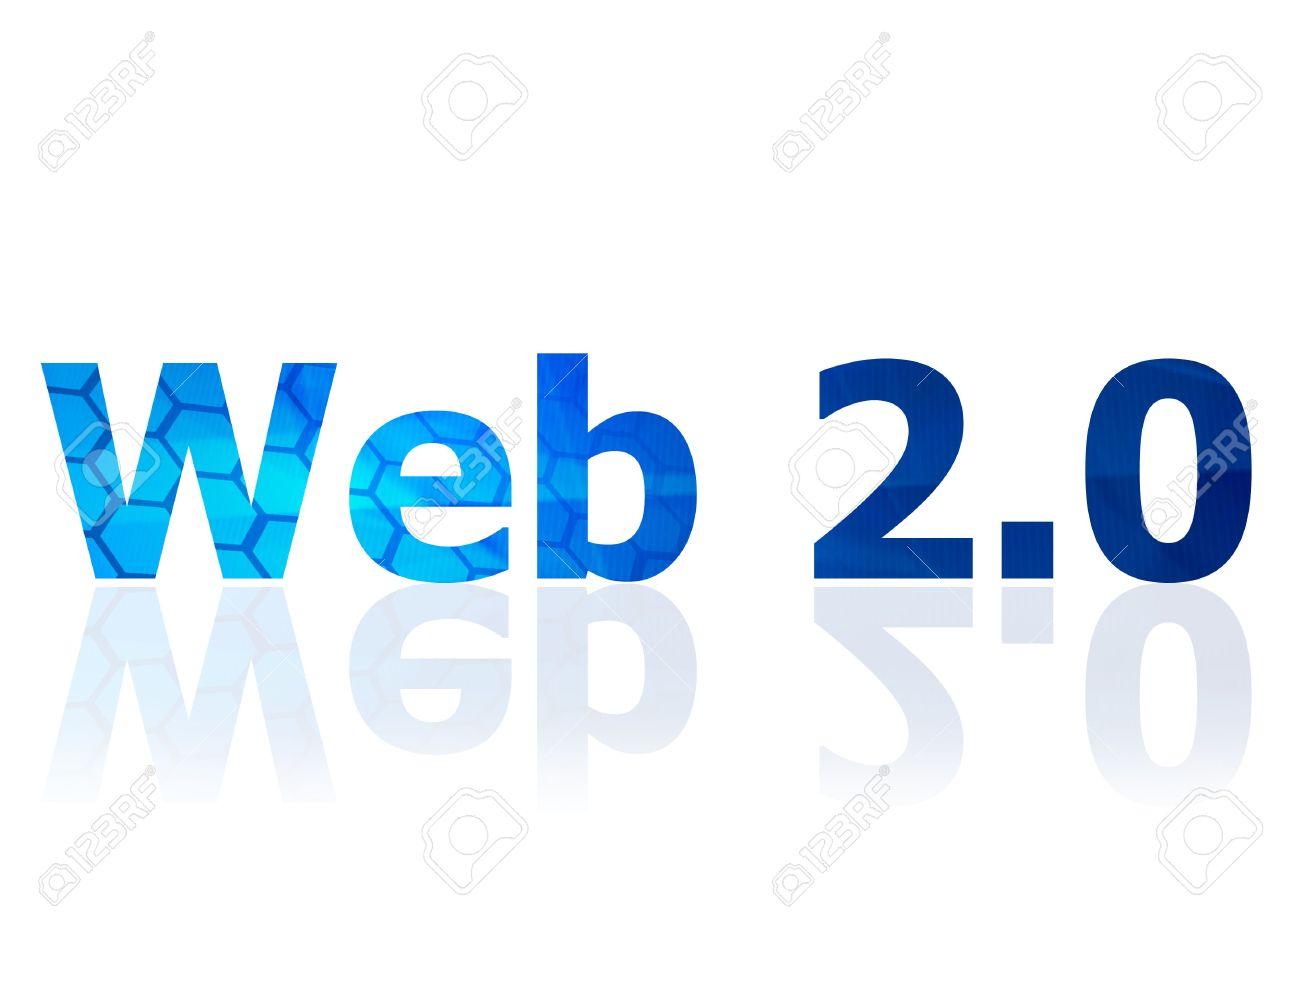 Handmade 40 Dofollow Web 2.0 Blog post for SEO